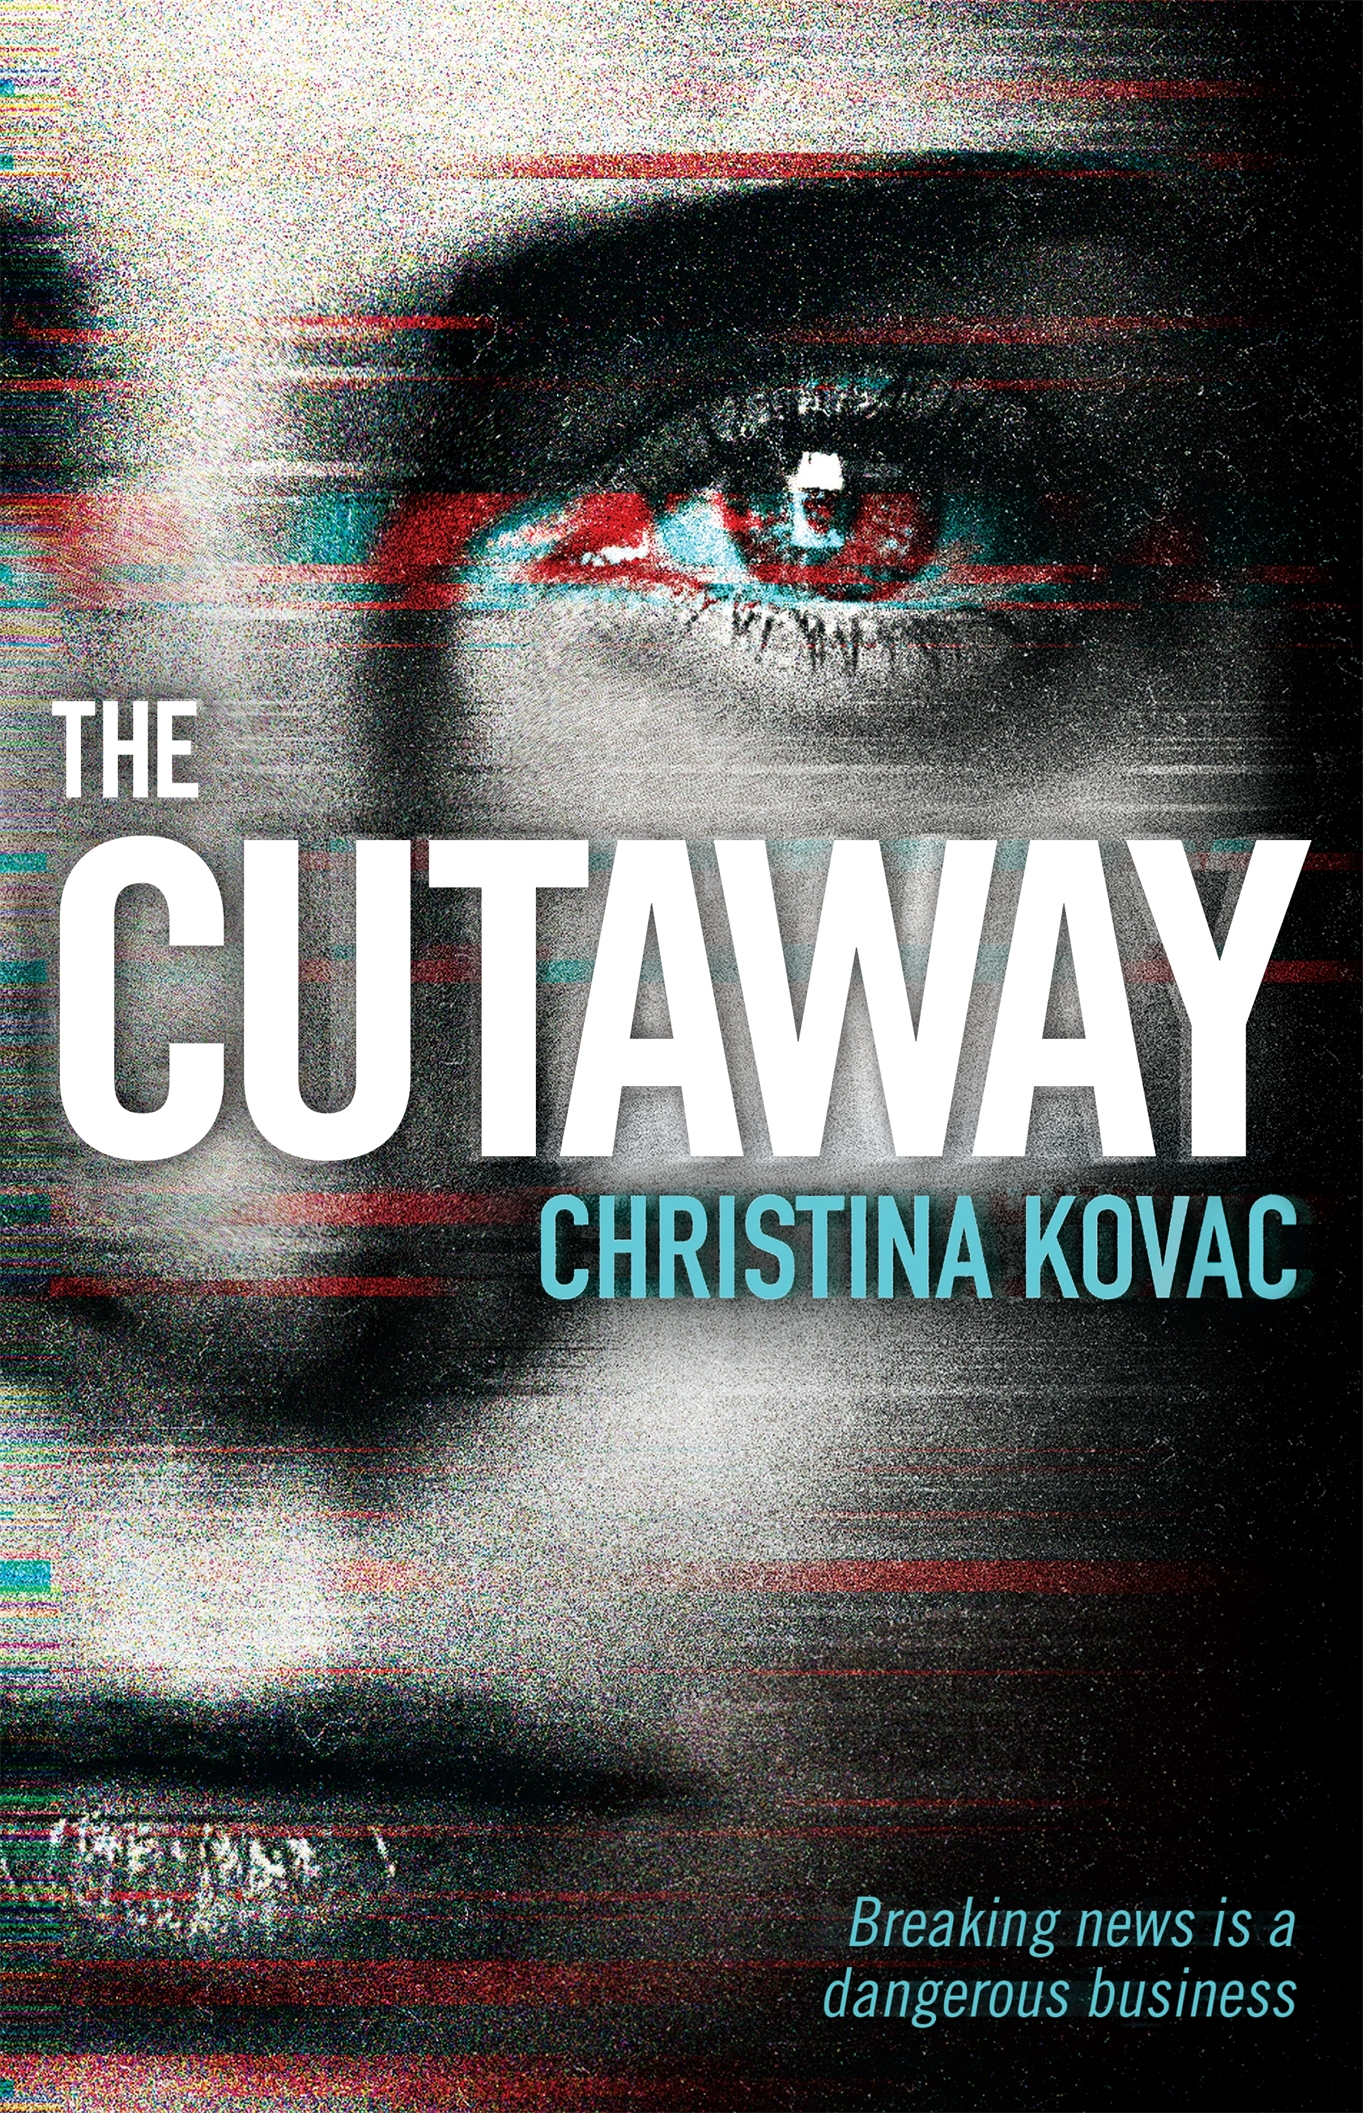 The Cutaway, UK edition